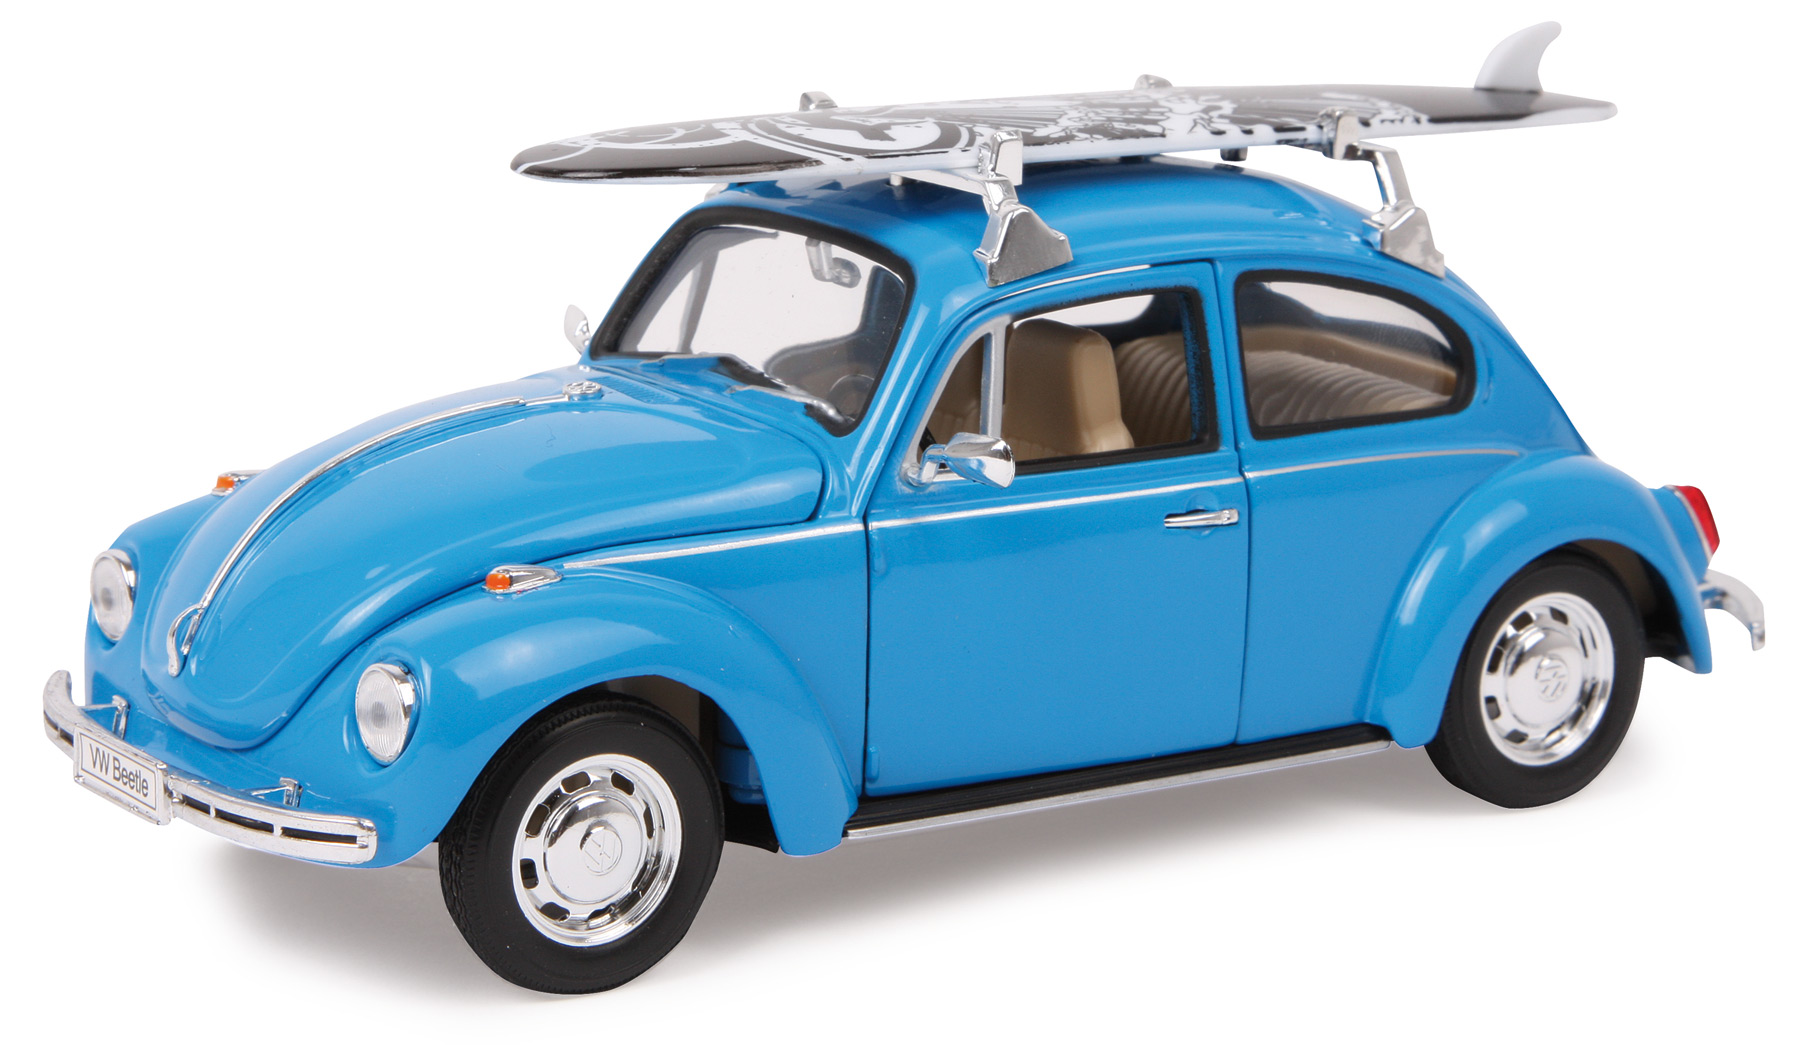 Automodello VW Beetle + tavola da surf